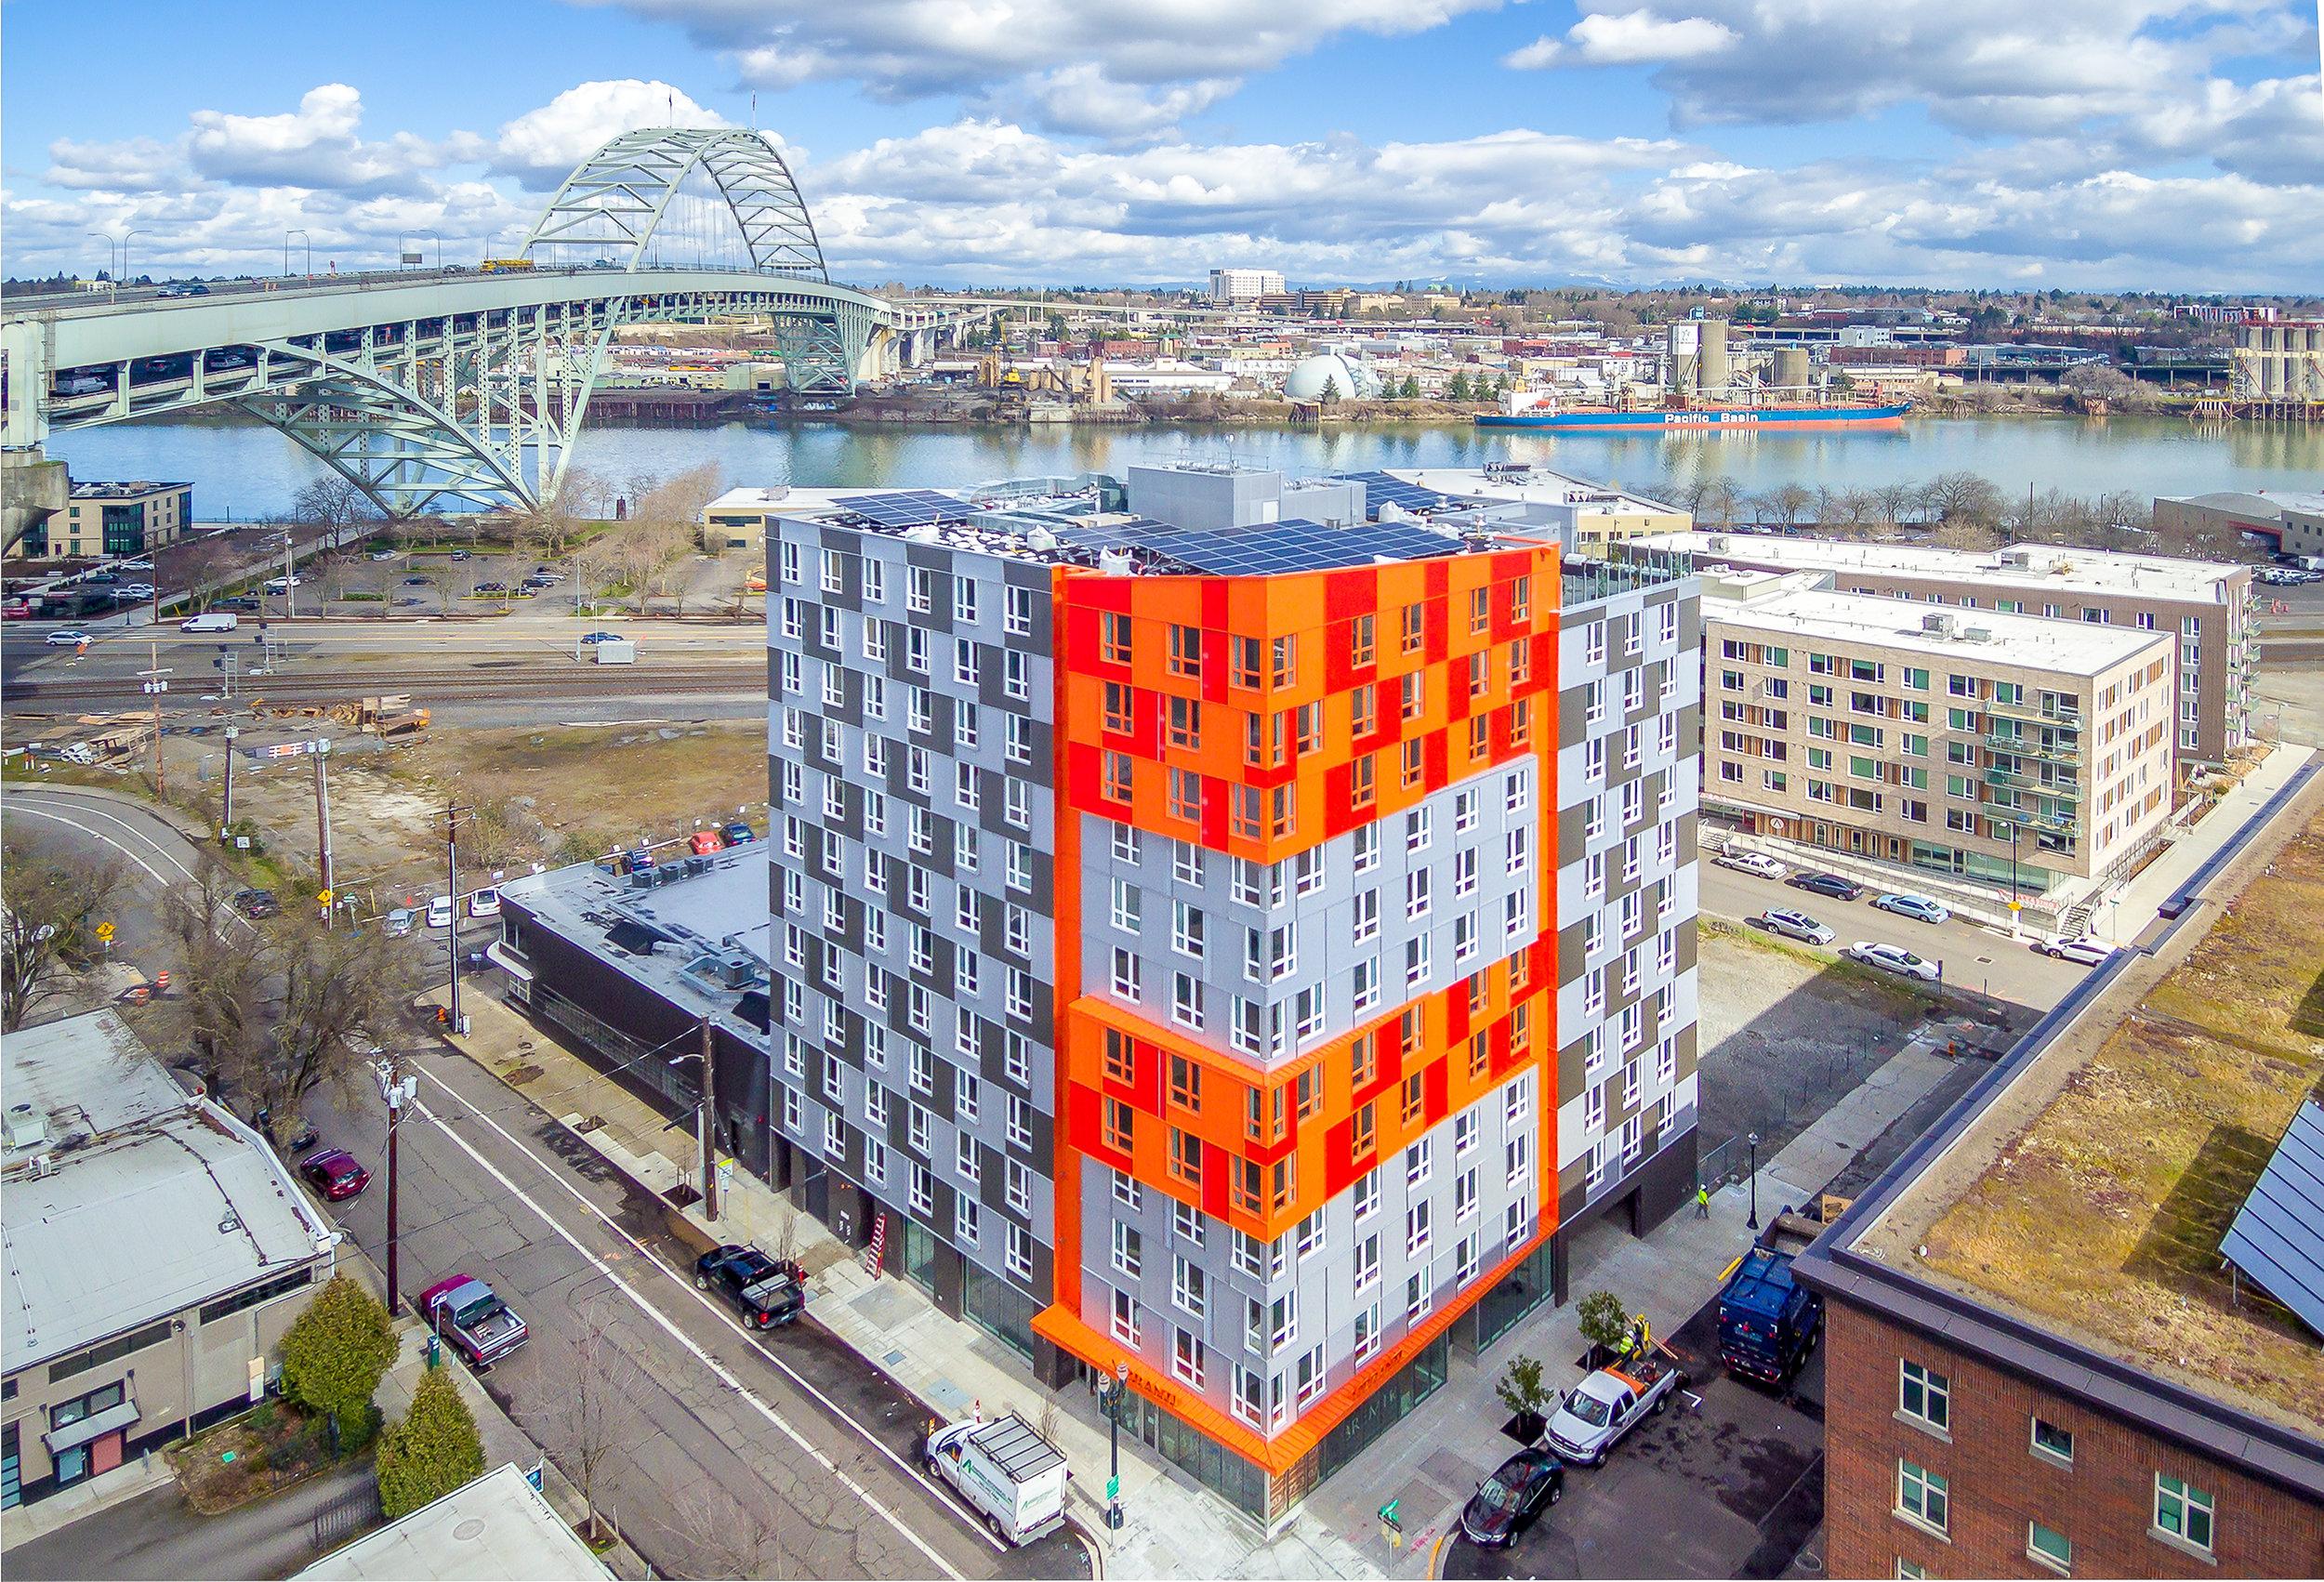 Vibrant Building Photo by Joshua James Huff (1 of 1).jpg